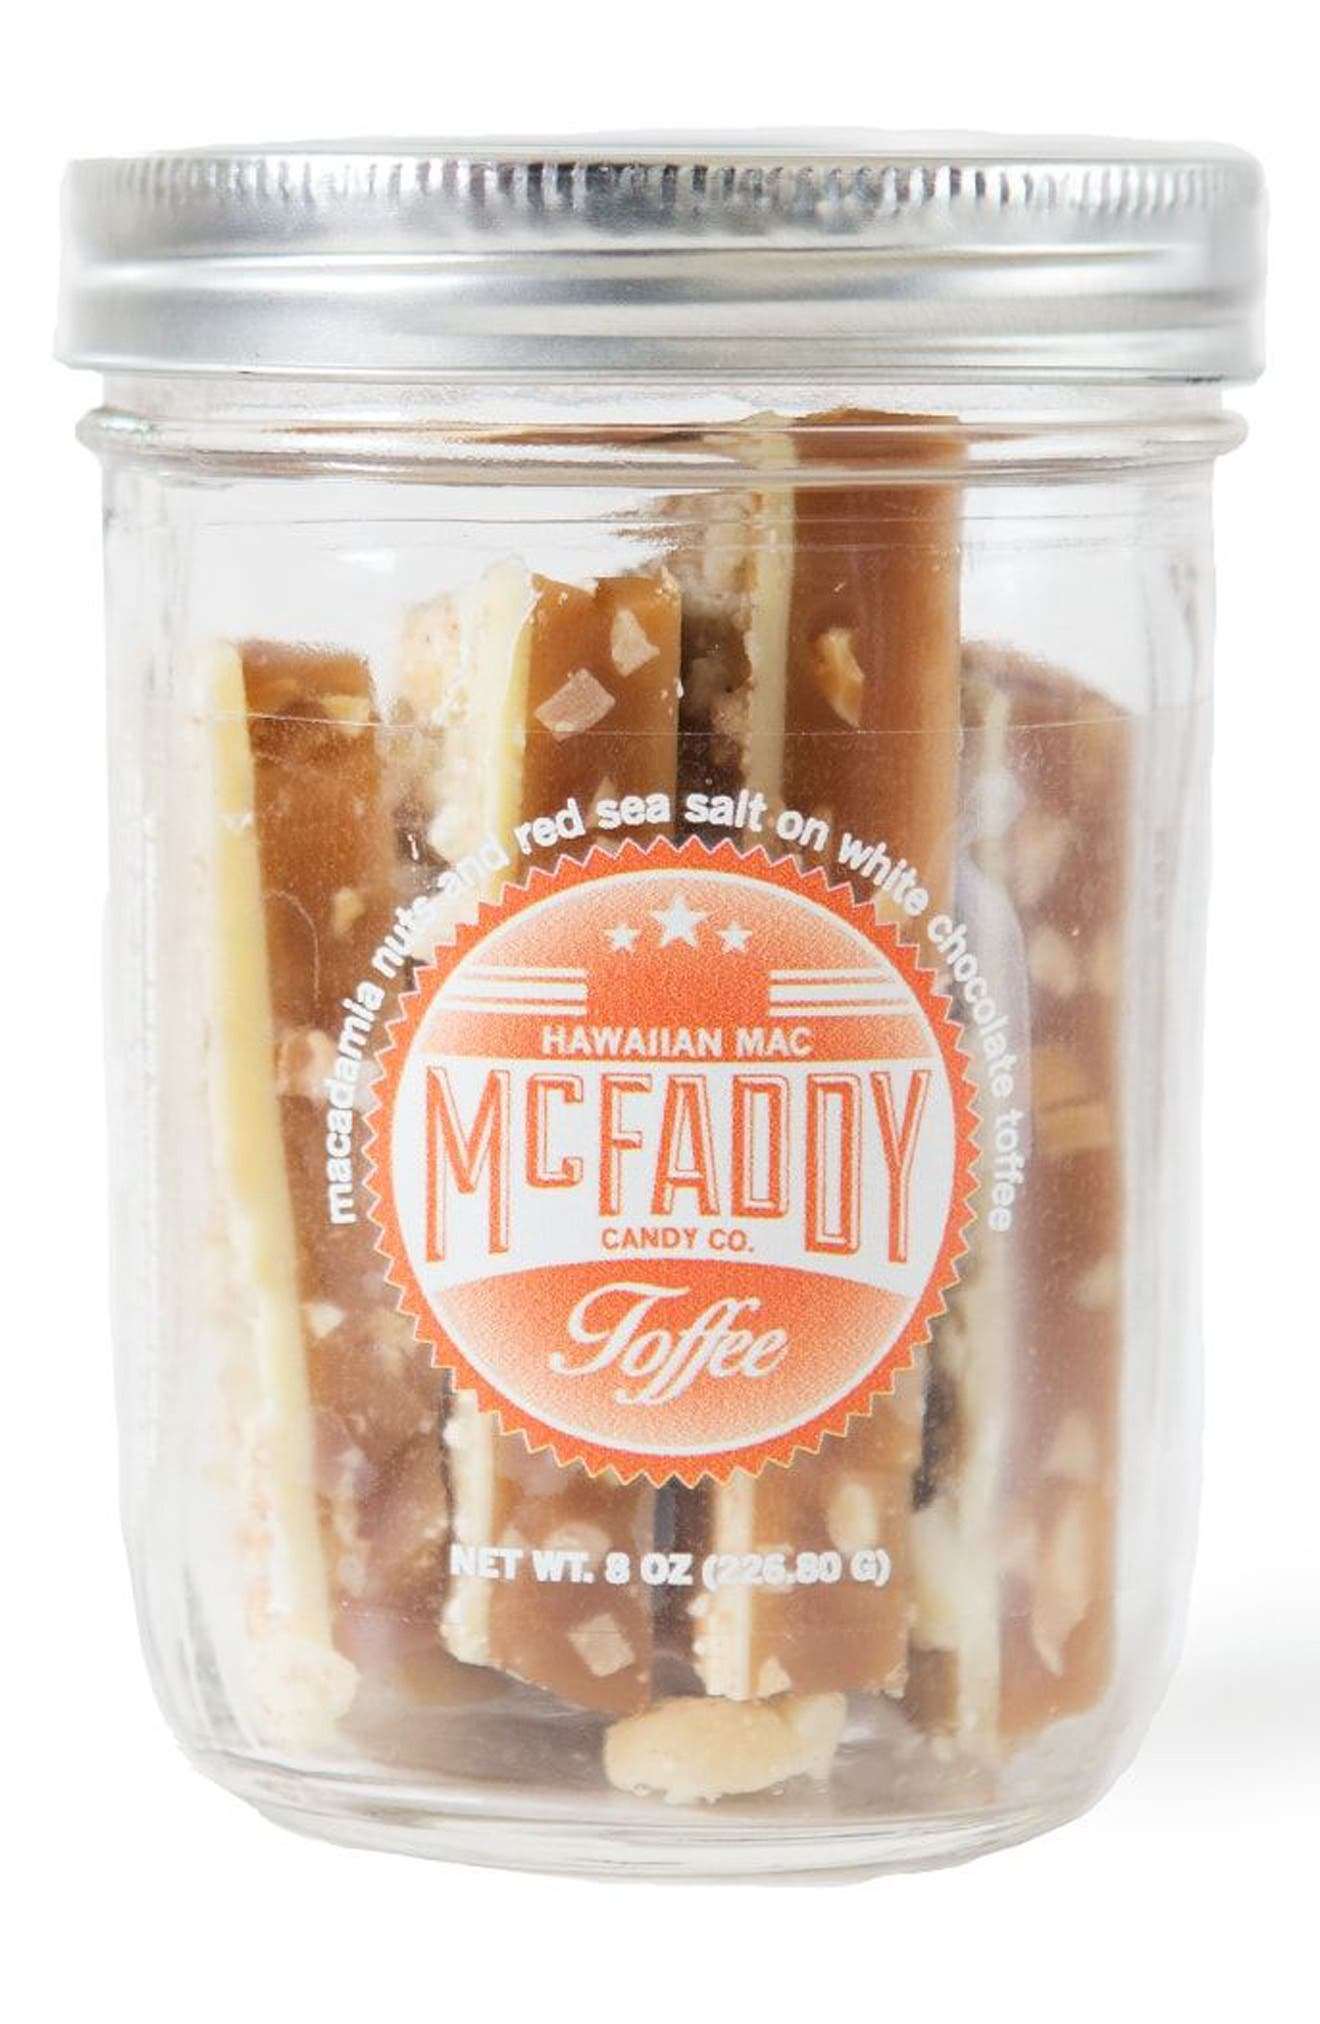 Alternate Image 1 Selected - McFaddy Candy Hawaiian Mac